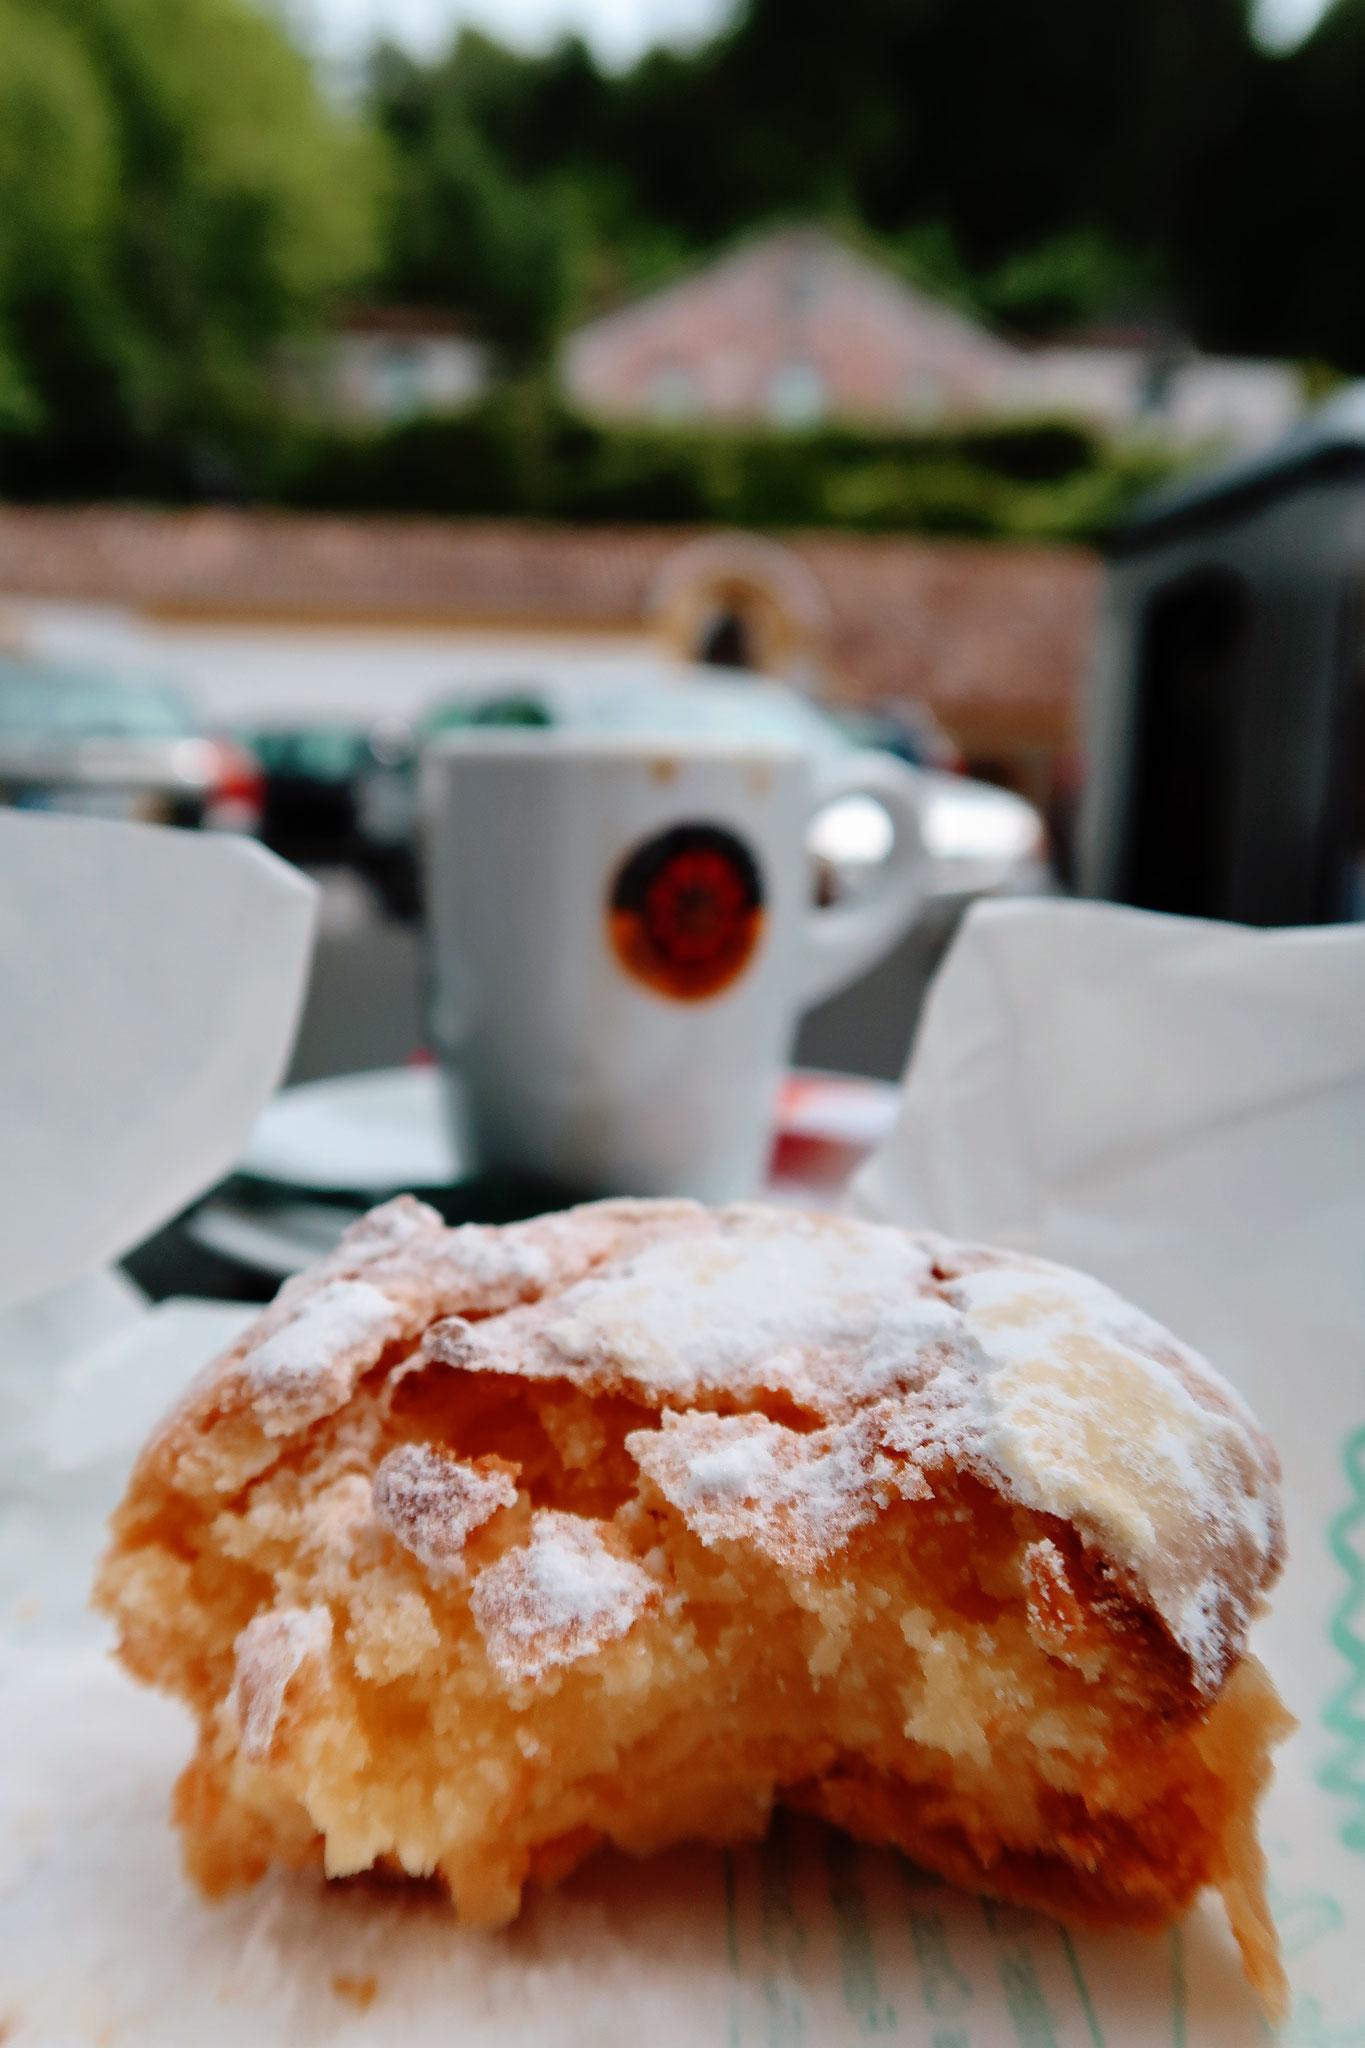 Queijada und Espresso